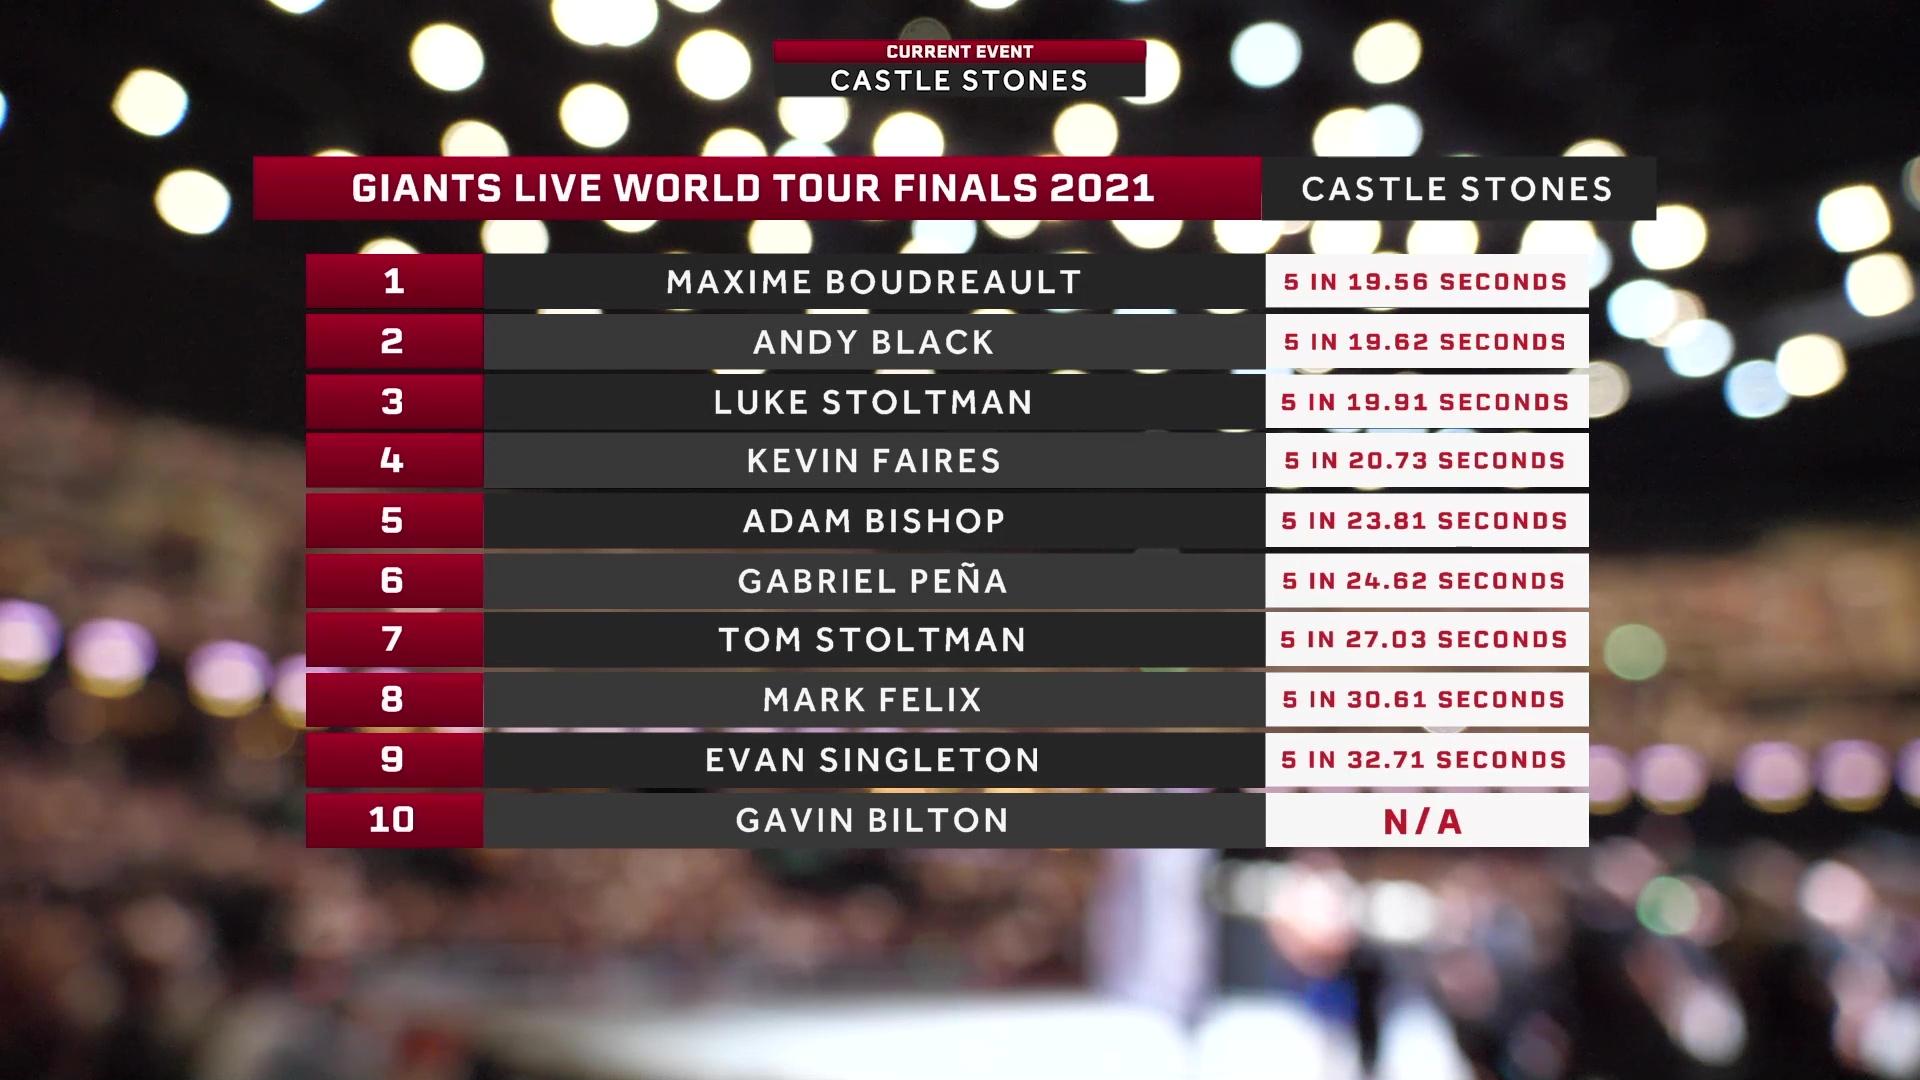 World Tour Finals Glasgow - Atlas Stones